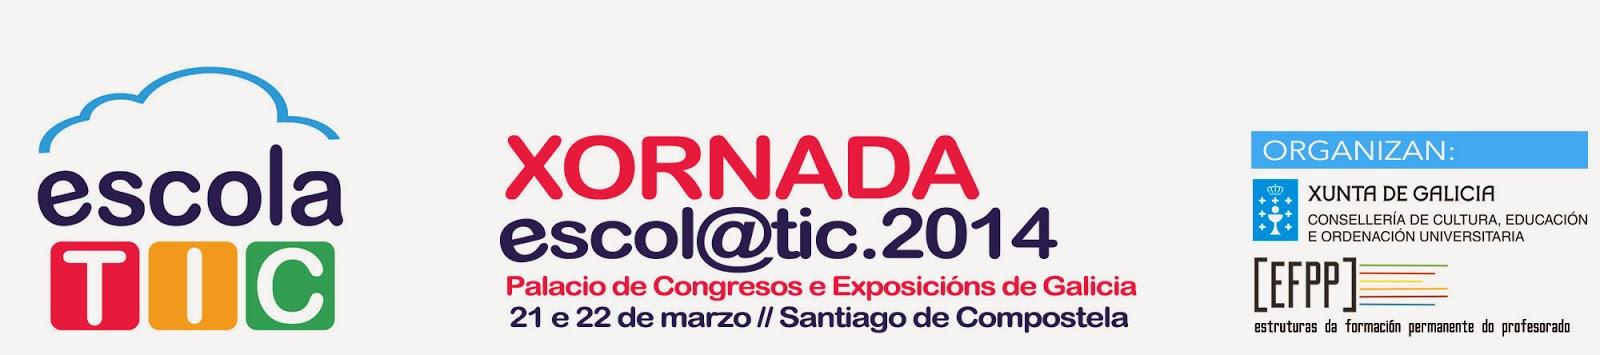 http://www.edu.xunta.es/centros/cafi/aulavirtual/file.php/1/escolatic/ESCOLATIC_2014.html